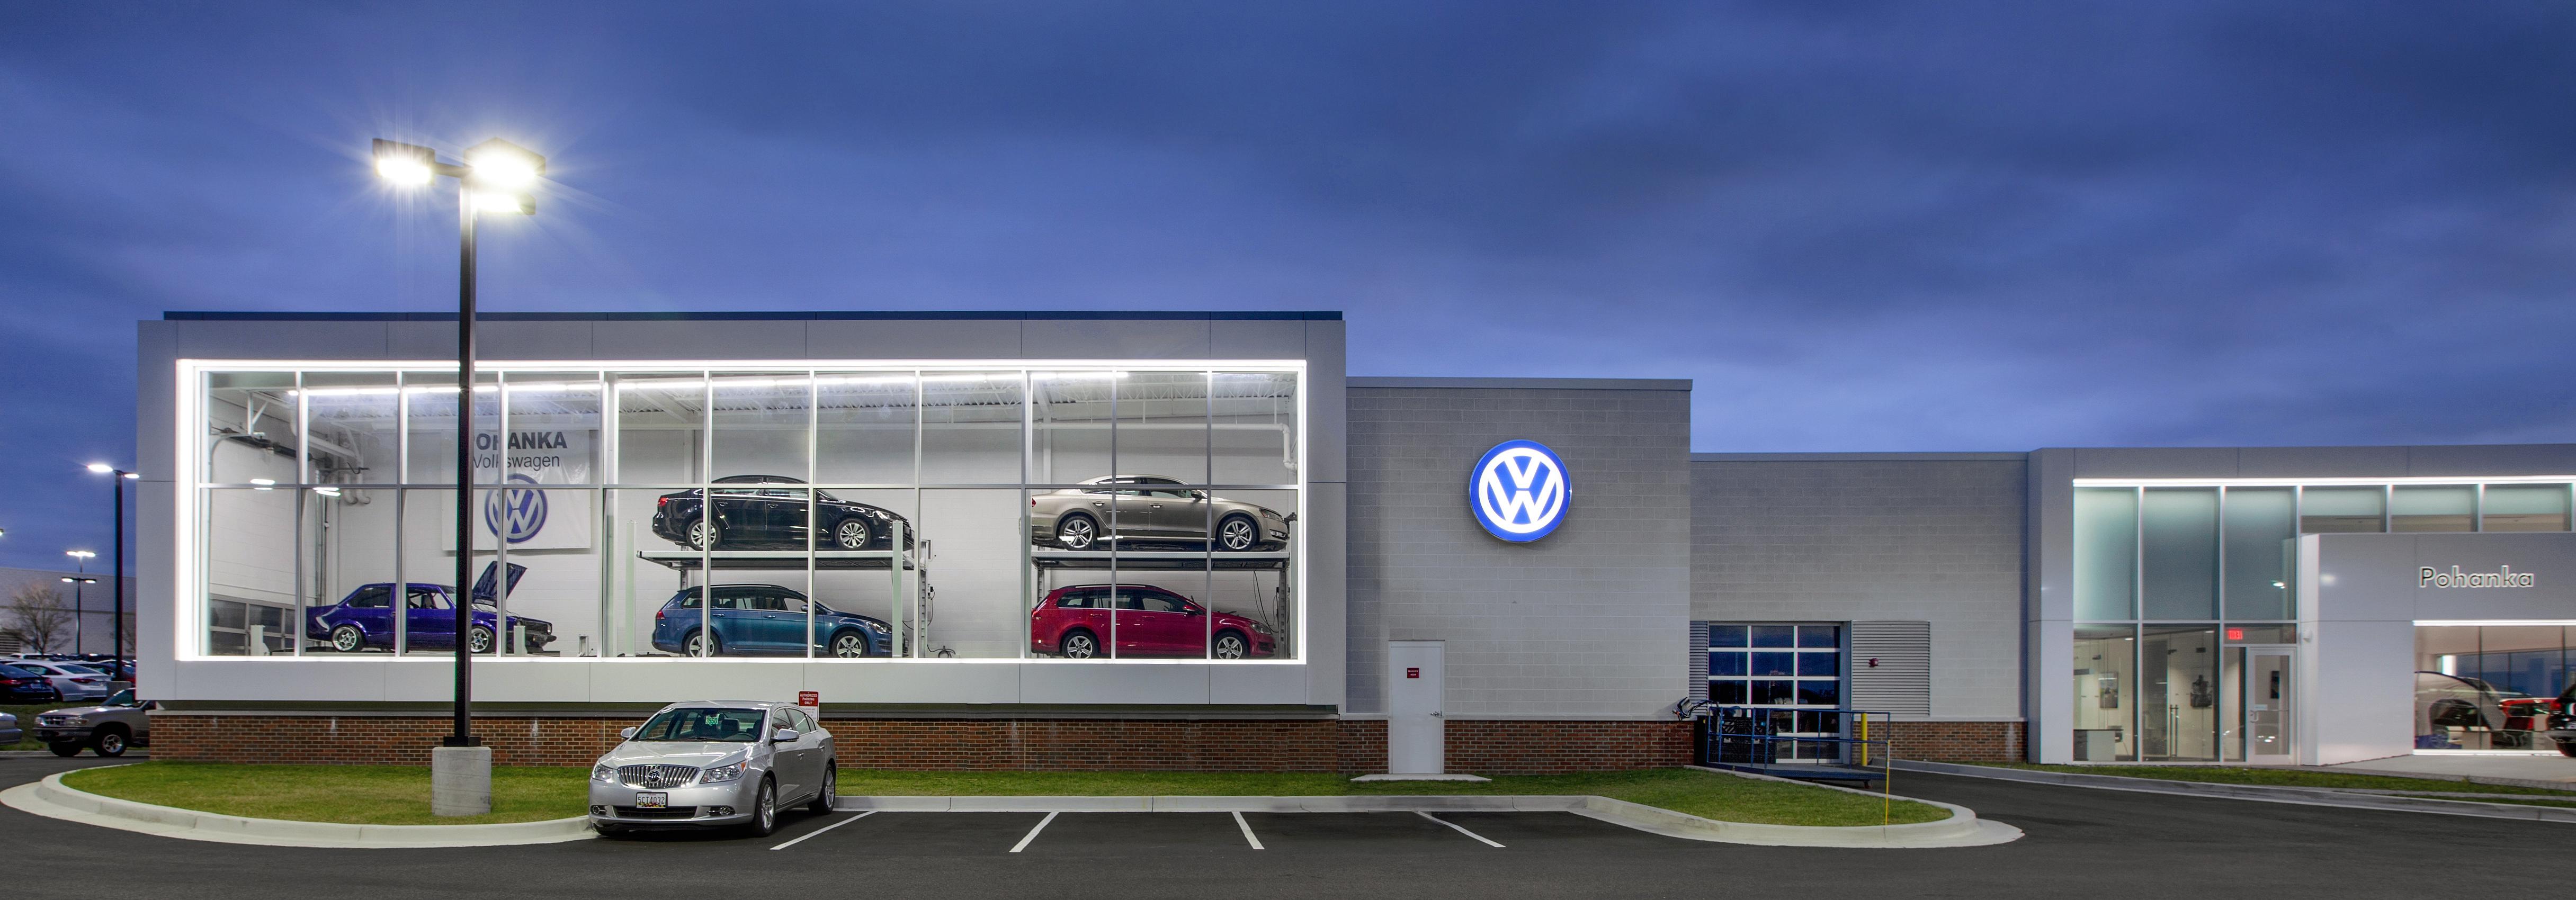 New Used Cars Maryland Virginia Washington Dc Pohanka